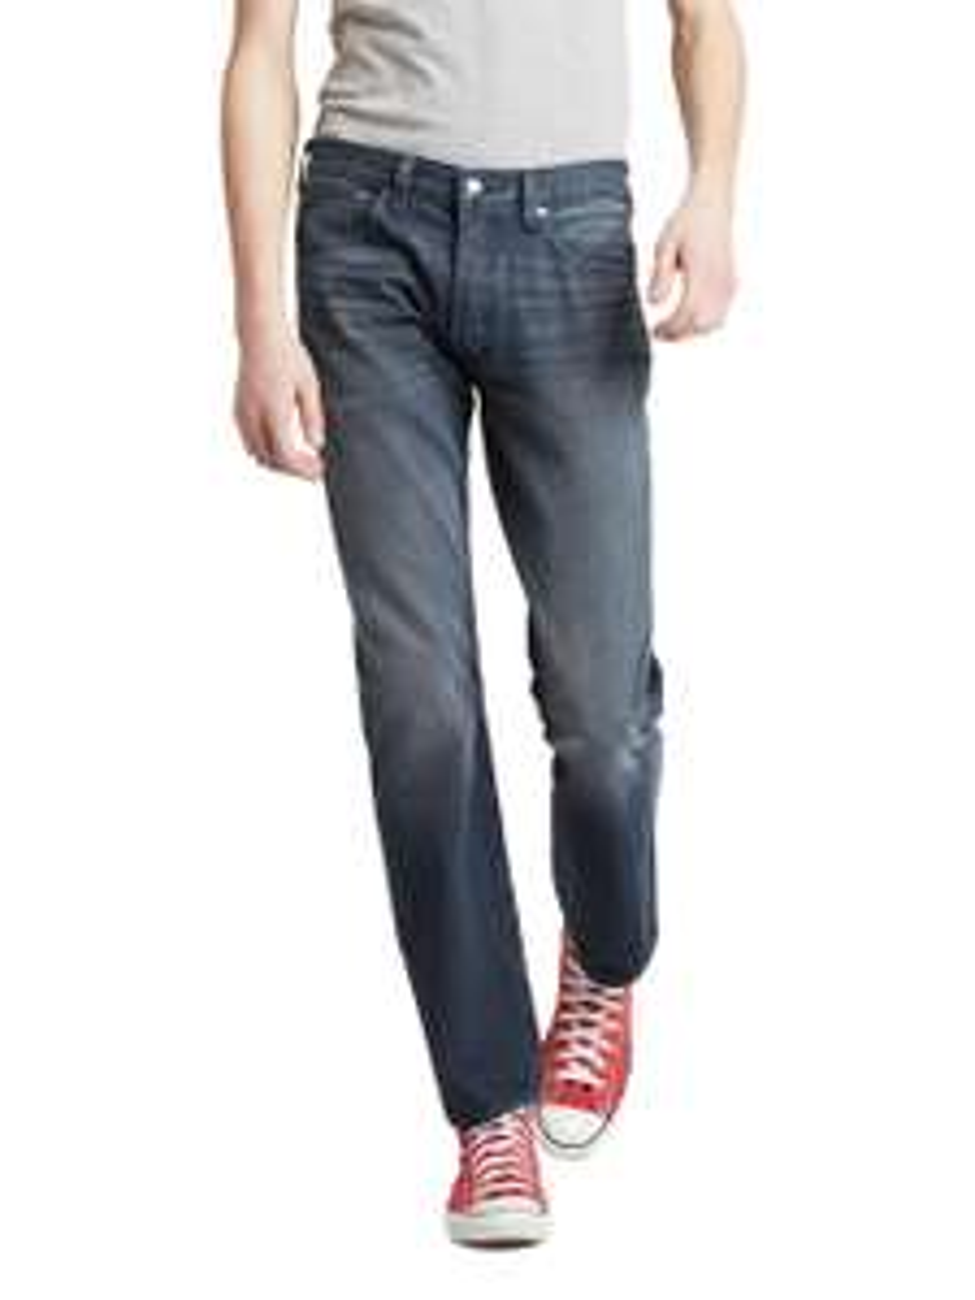 [Jeans-direct] 10 % auf alles bei Zahlart Amazon Pay - z.B. Levis® Herren Jeans 501® - Original Fit - Blau - Space Money